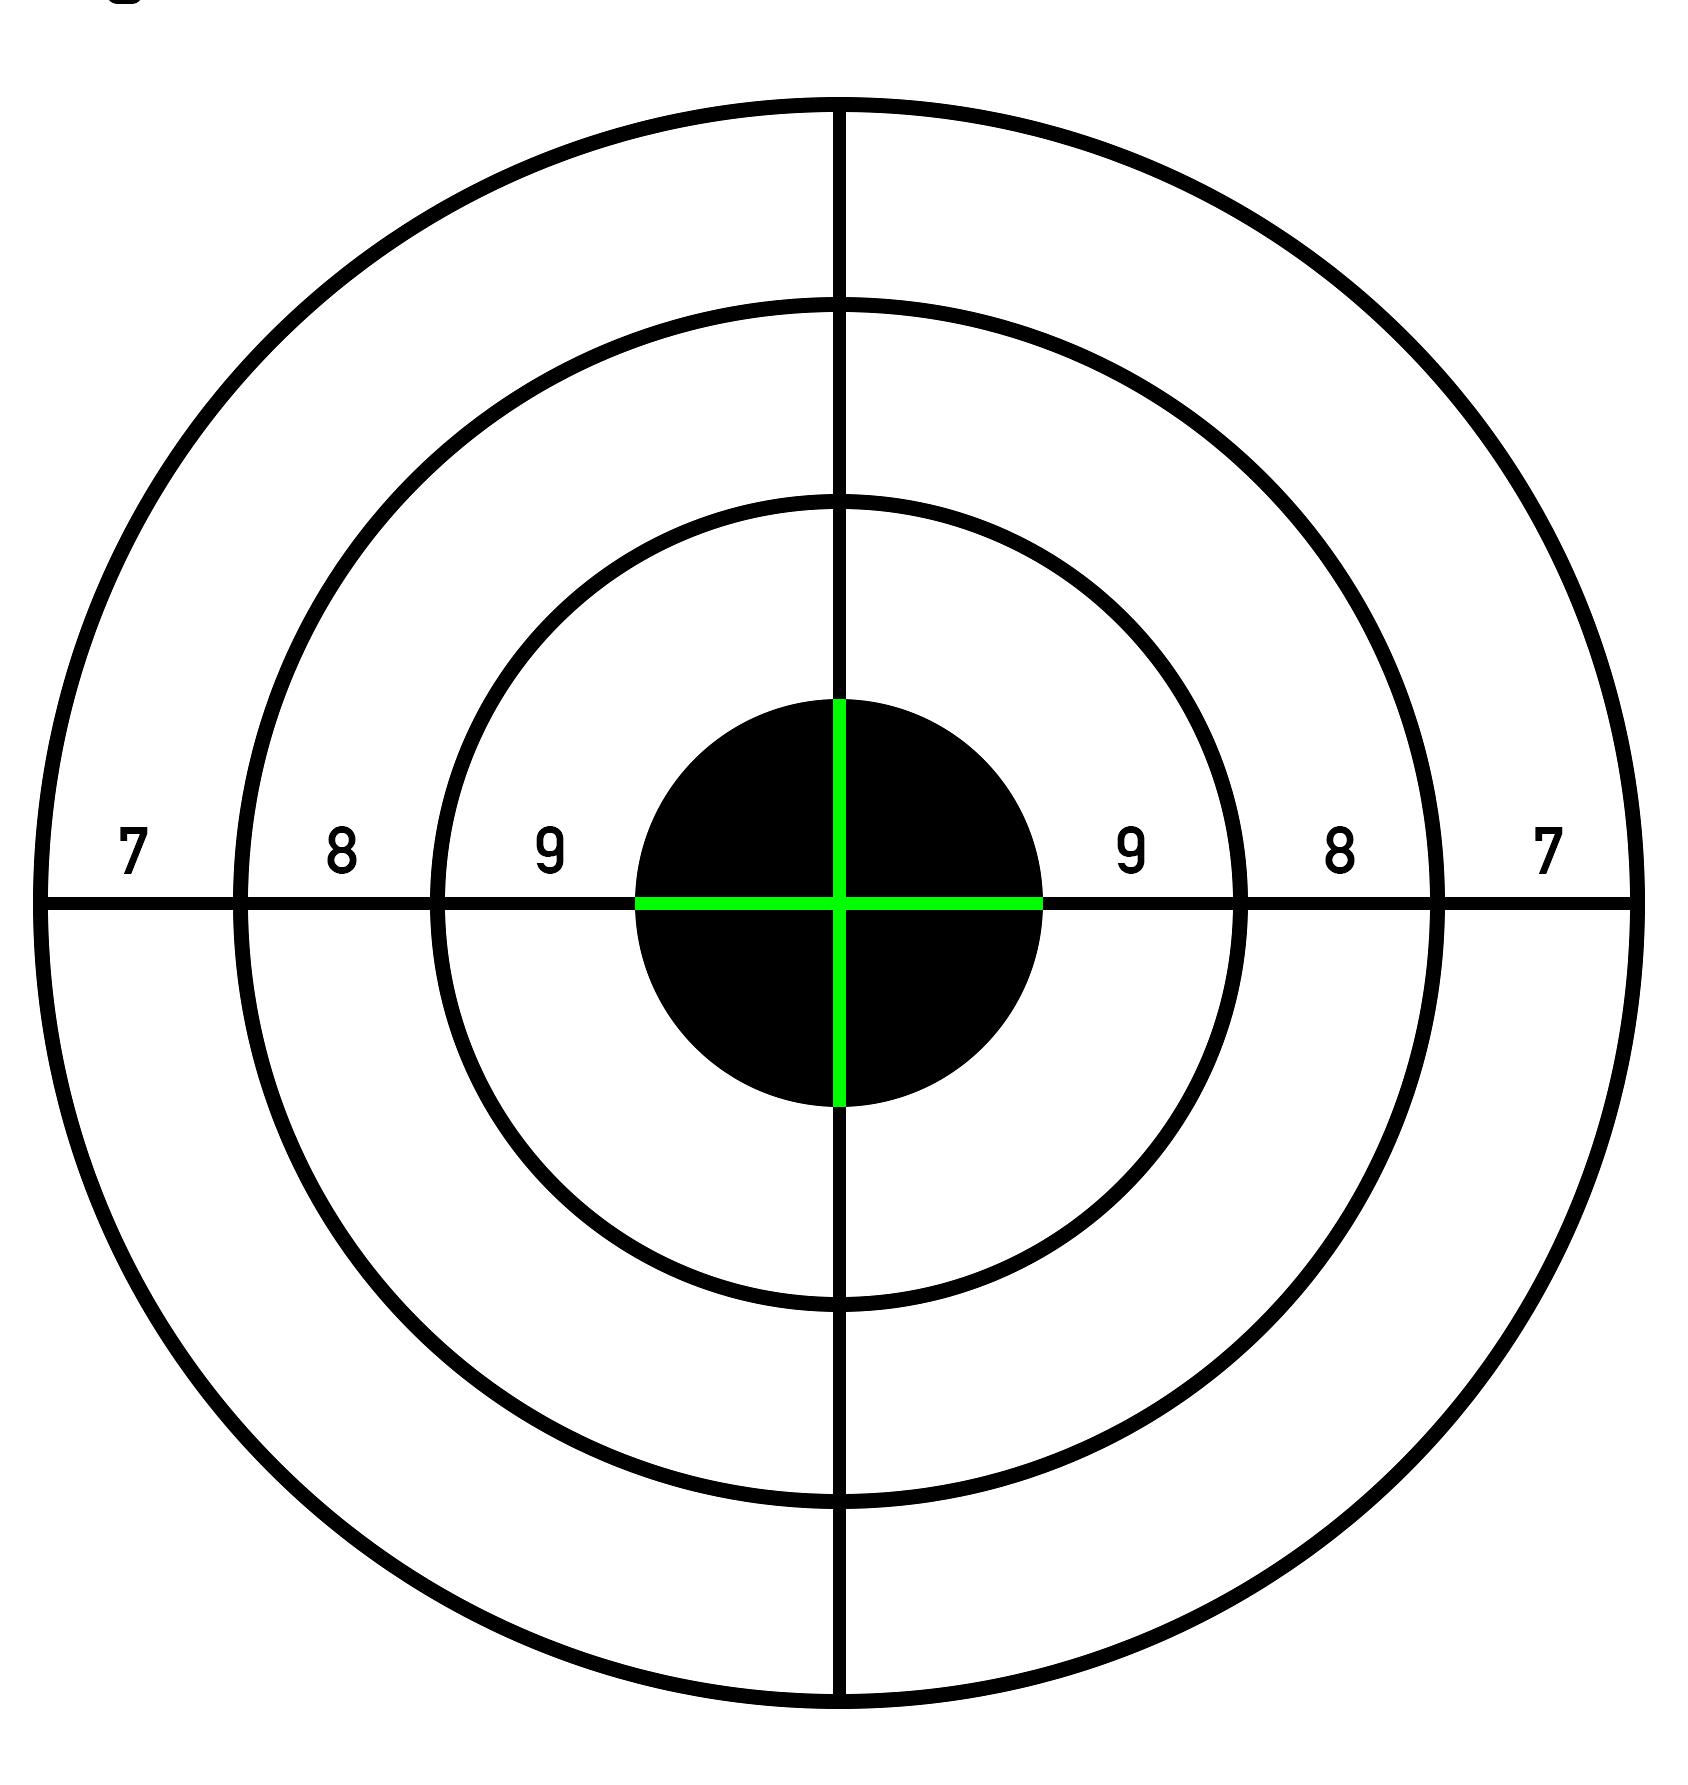 Paper Shooting Targets Pistol Paper Shooting Targets Shooting Targets Paper Targets